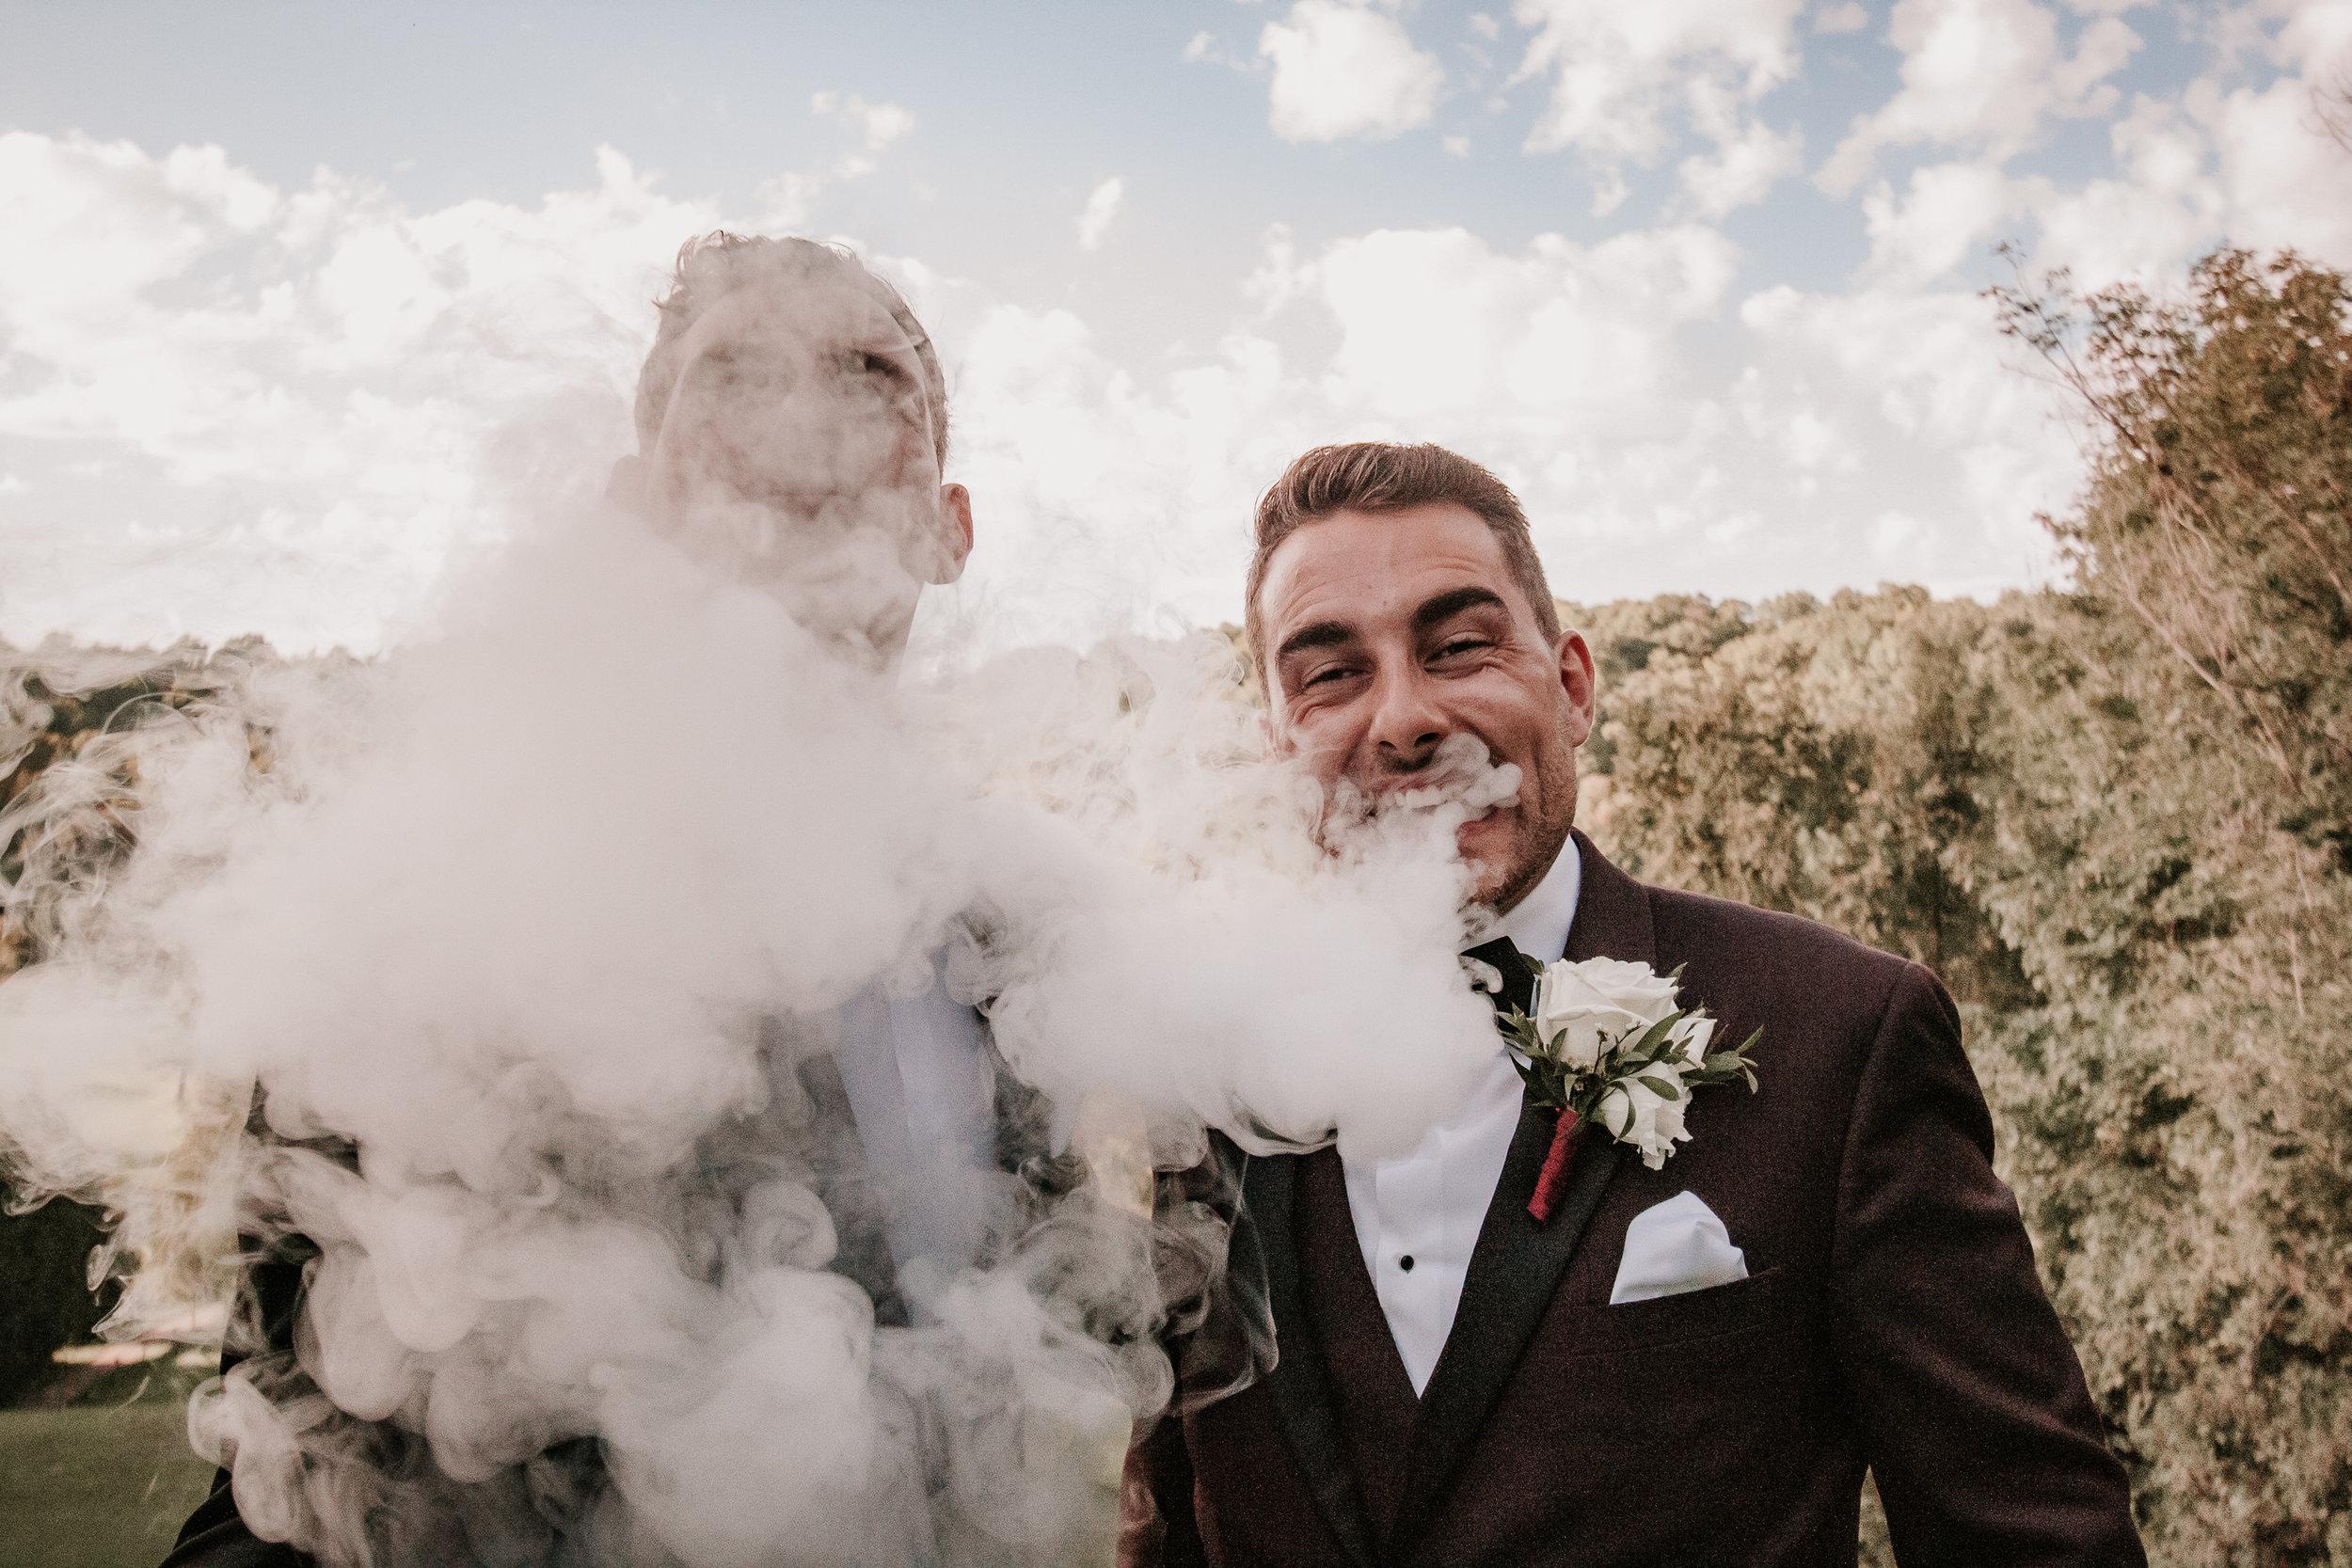 Claremont_fourseasons_Wedding-325.jpg